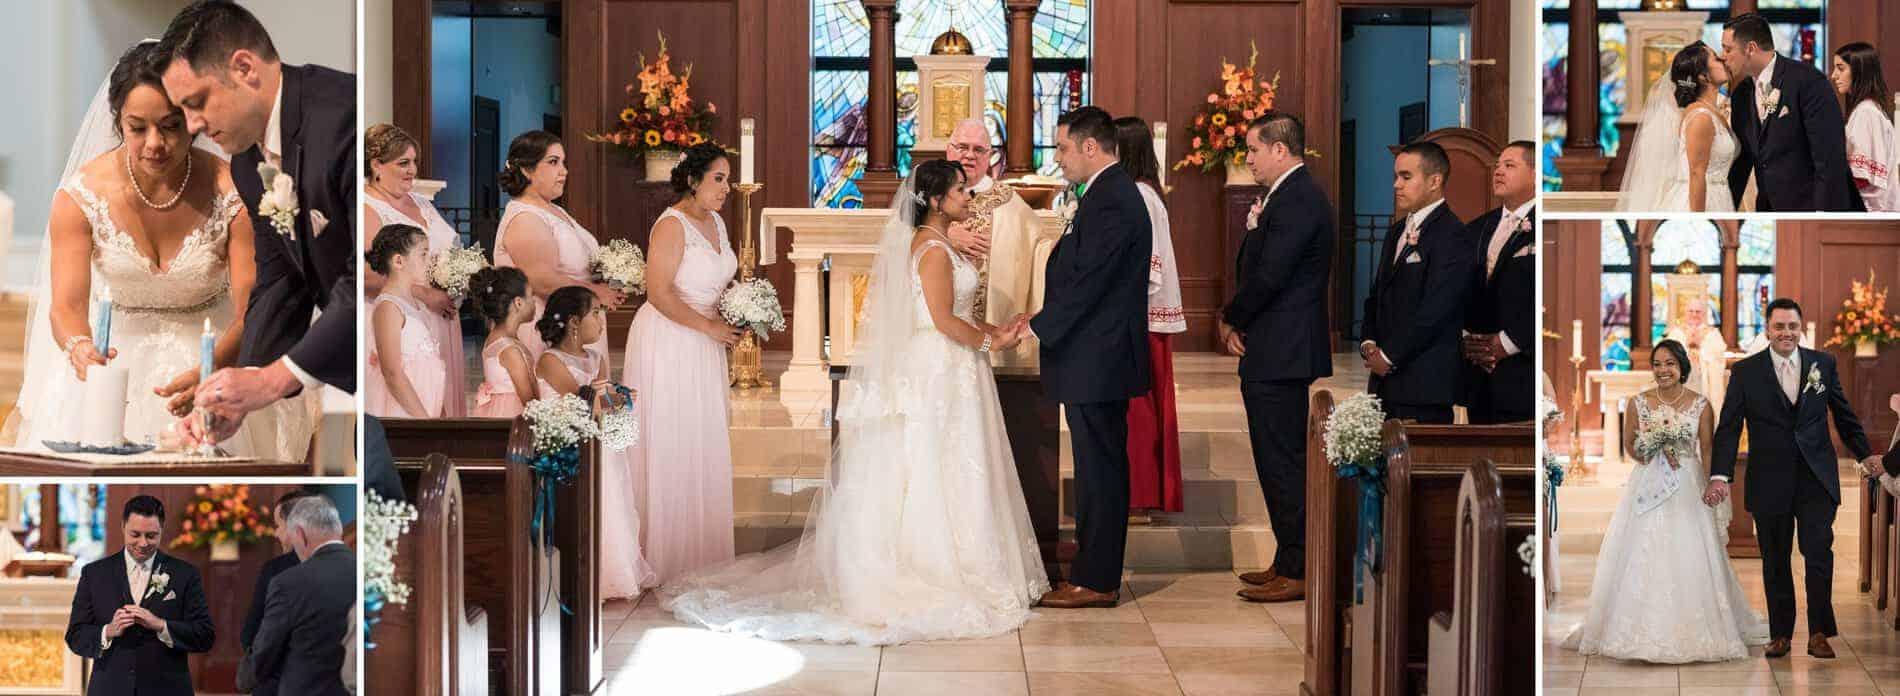 Corpus Christi Catholic Church Wedding Ceremony